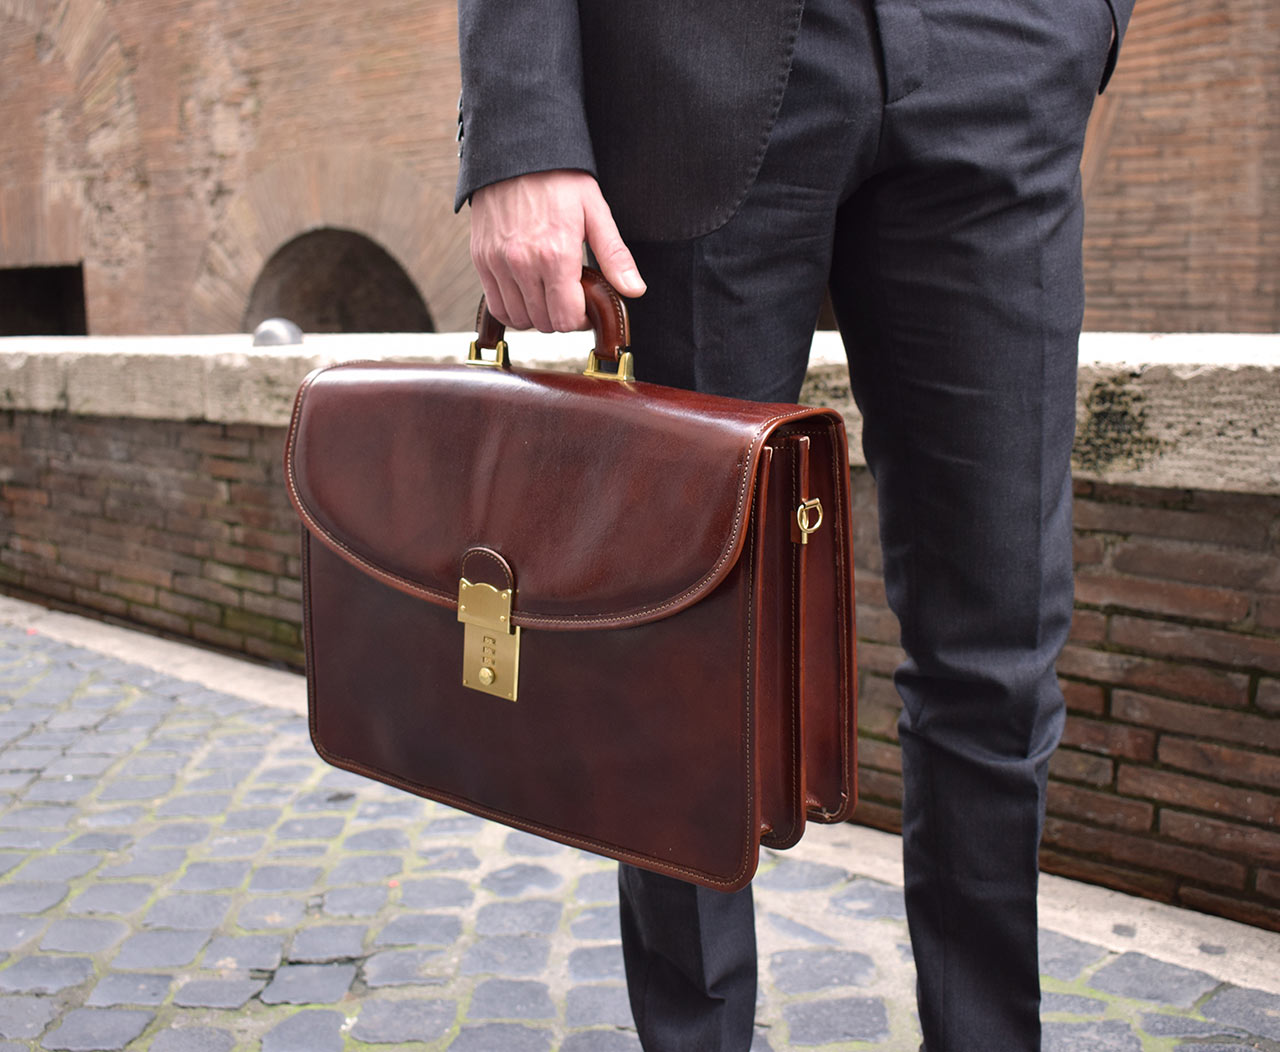 Italian leather handmade briefcase, Mancini Leather Since 1918